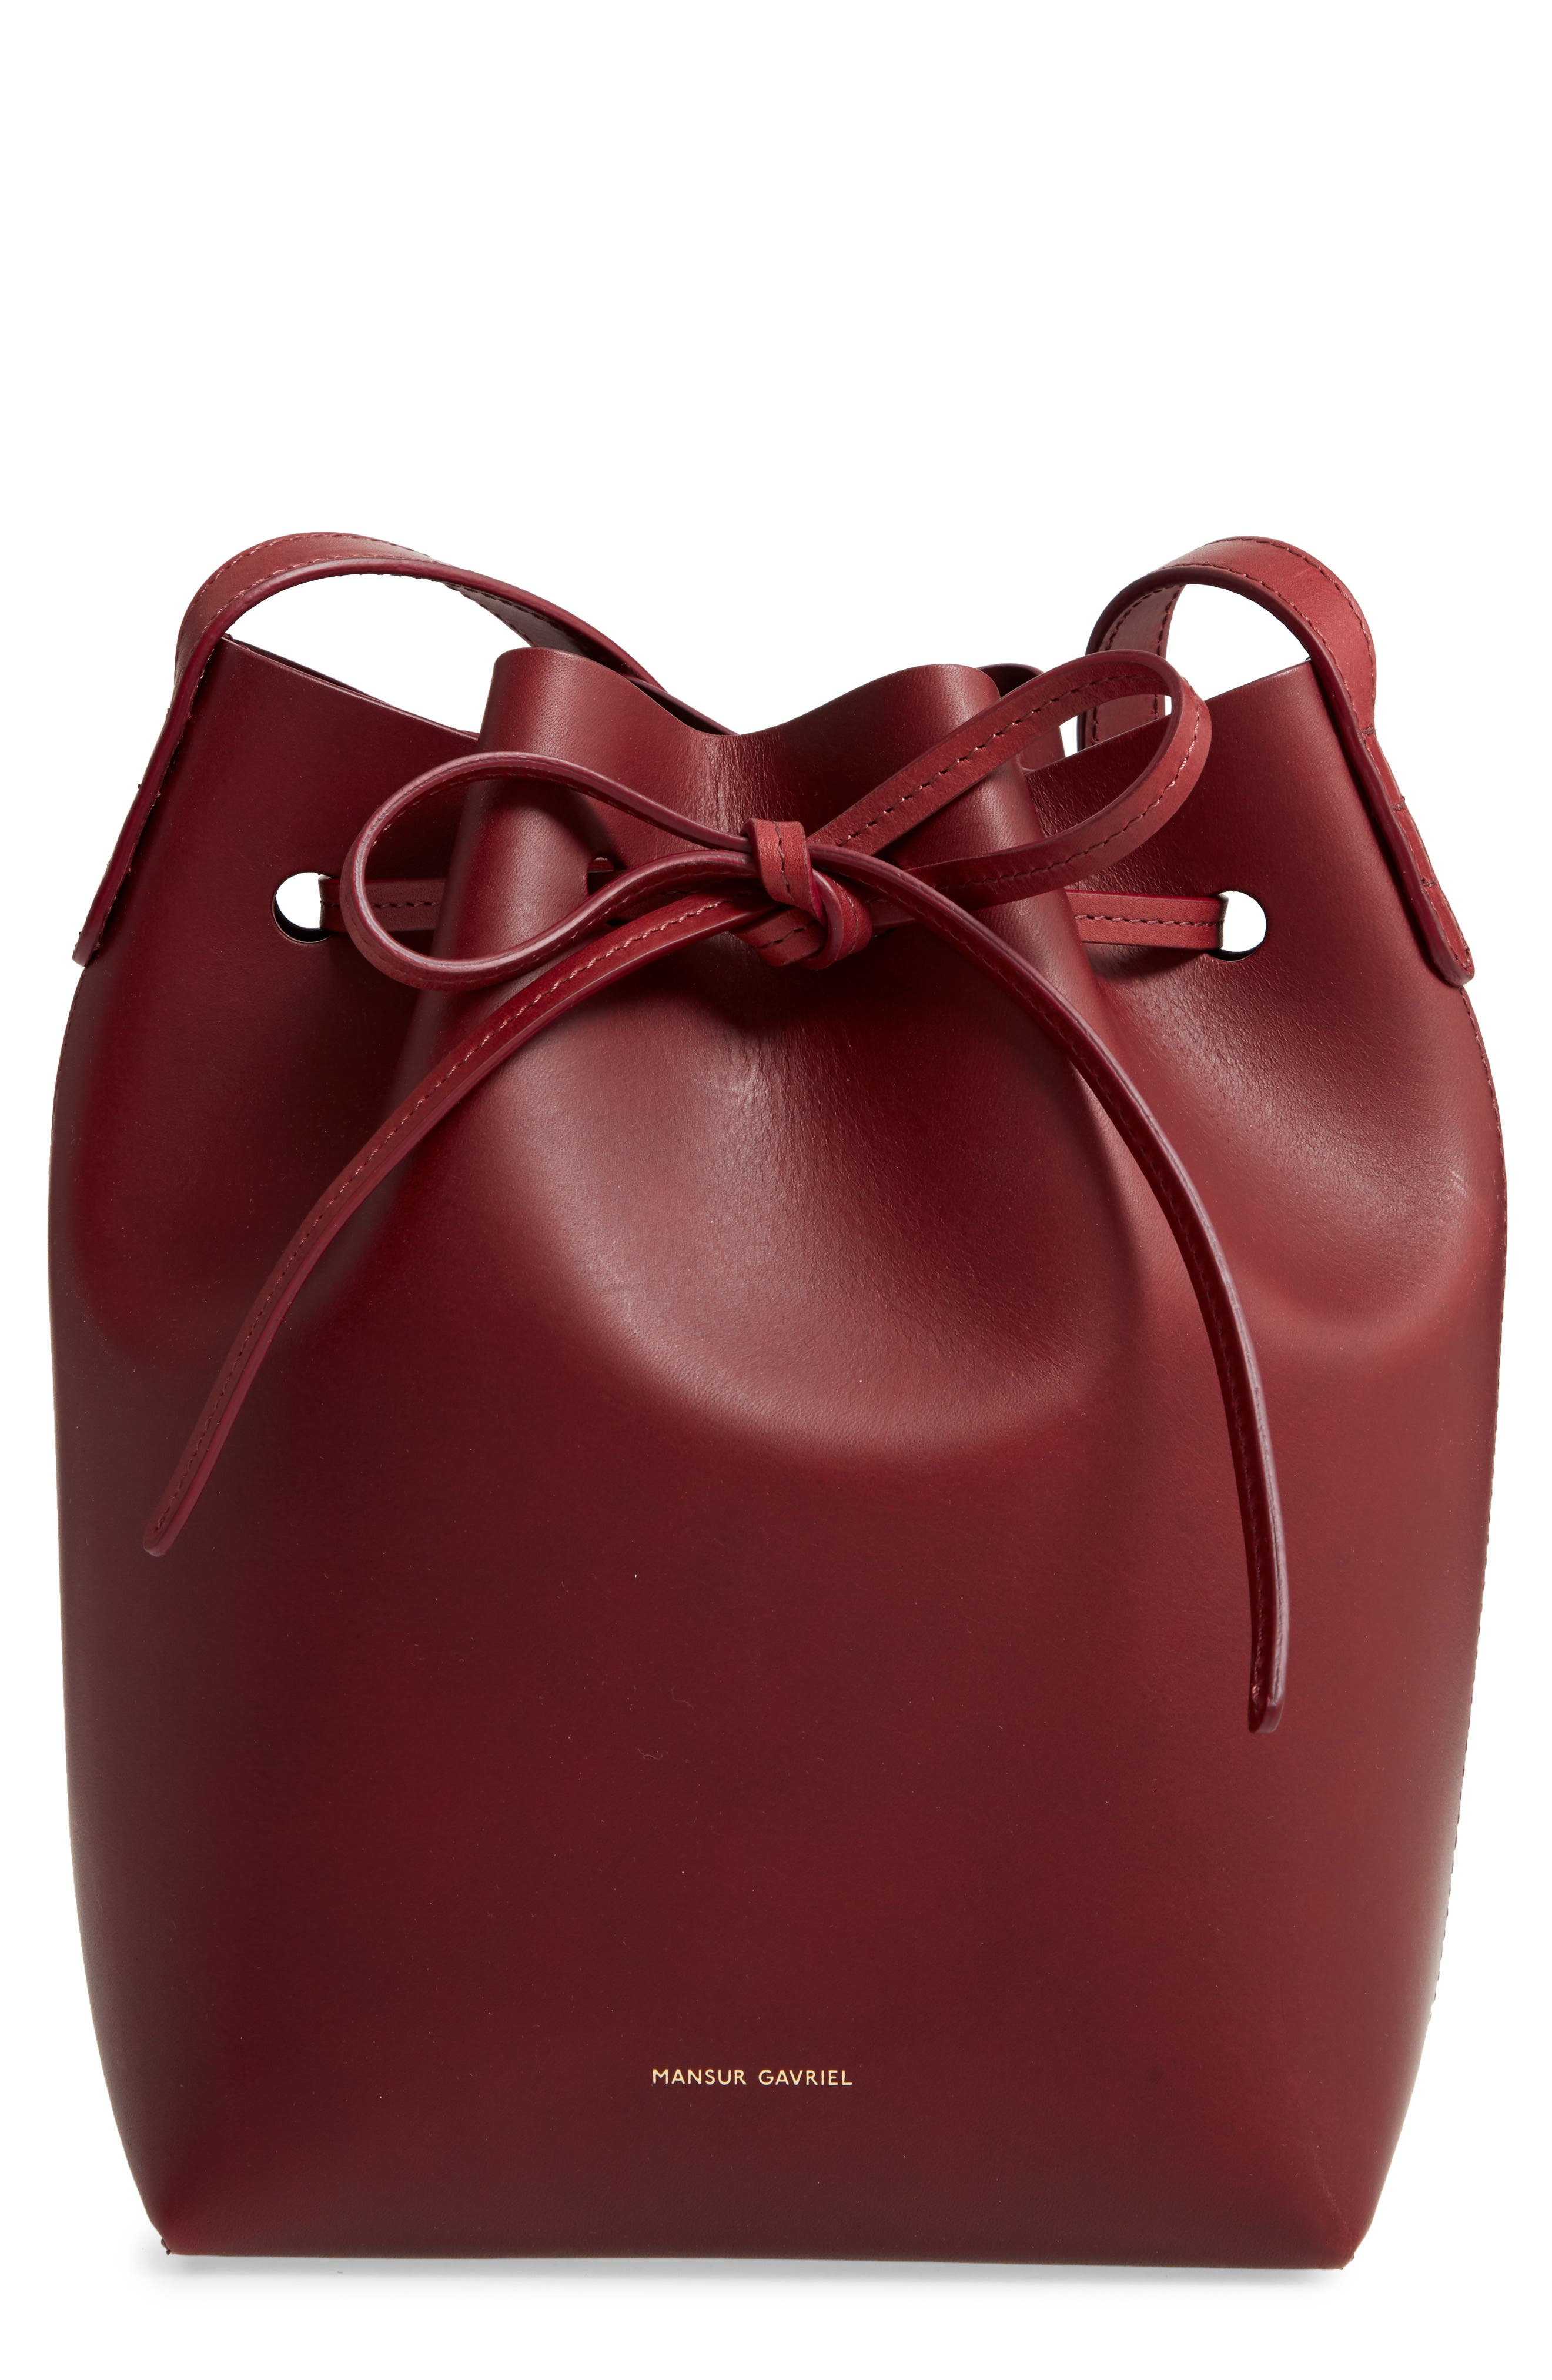 450db9e7f Mansur Gavriel Handbags & Purses | Nordstrom